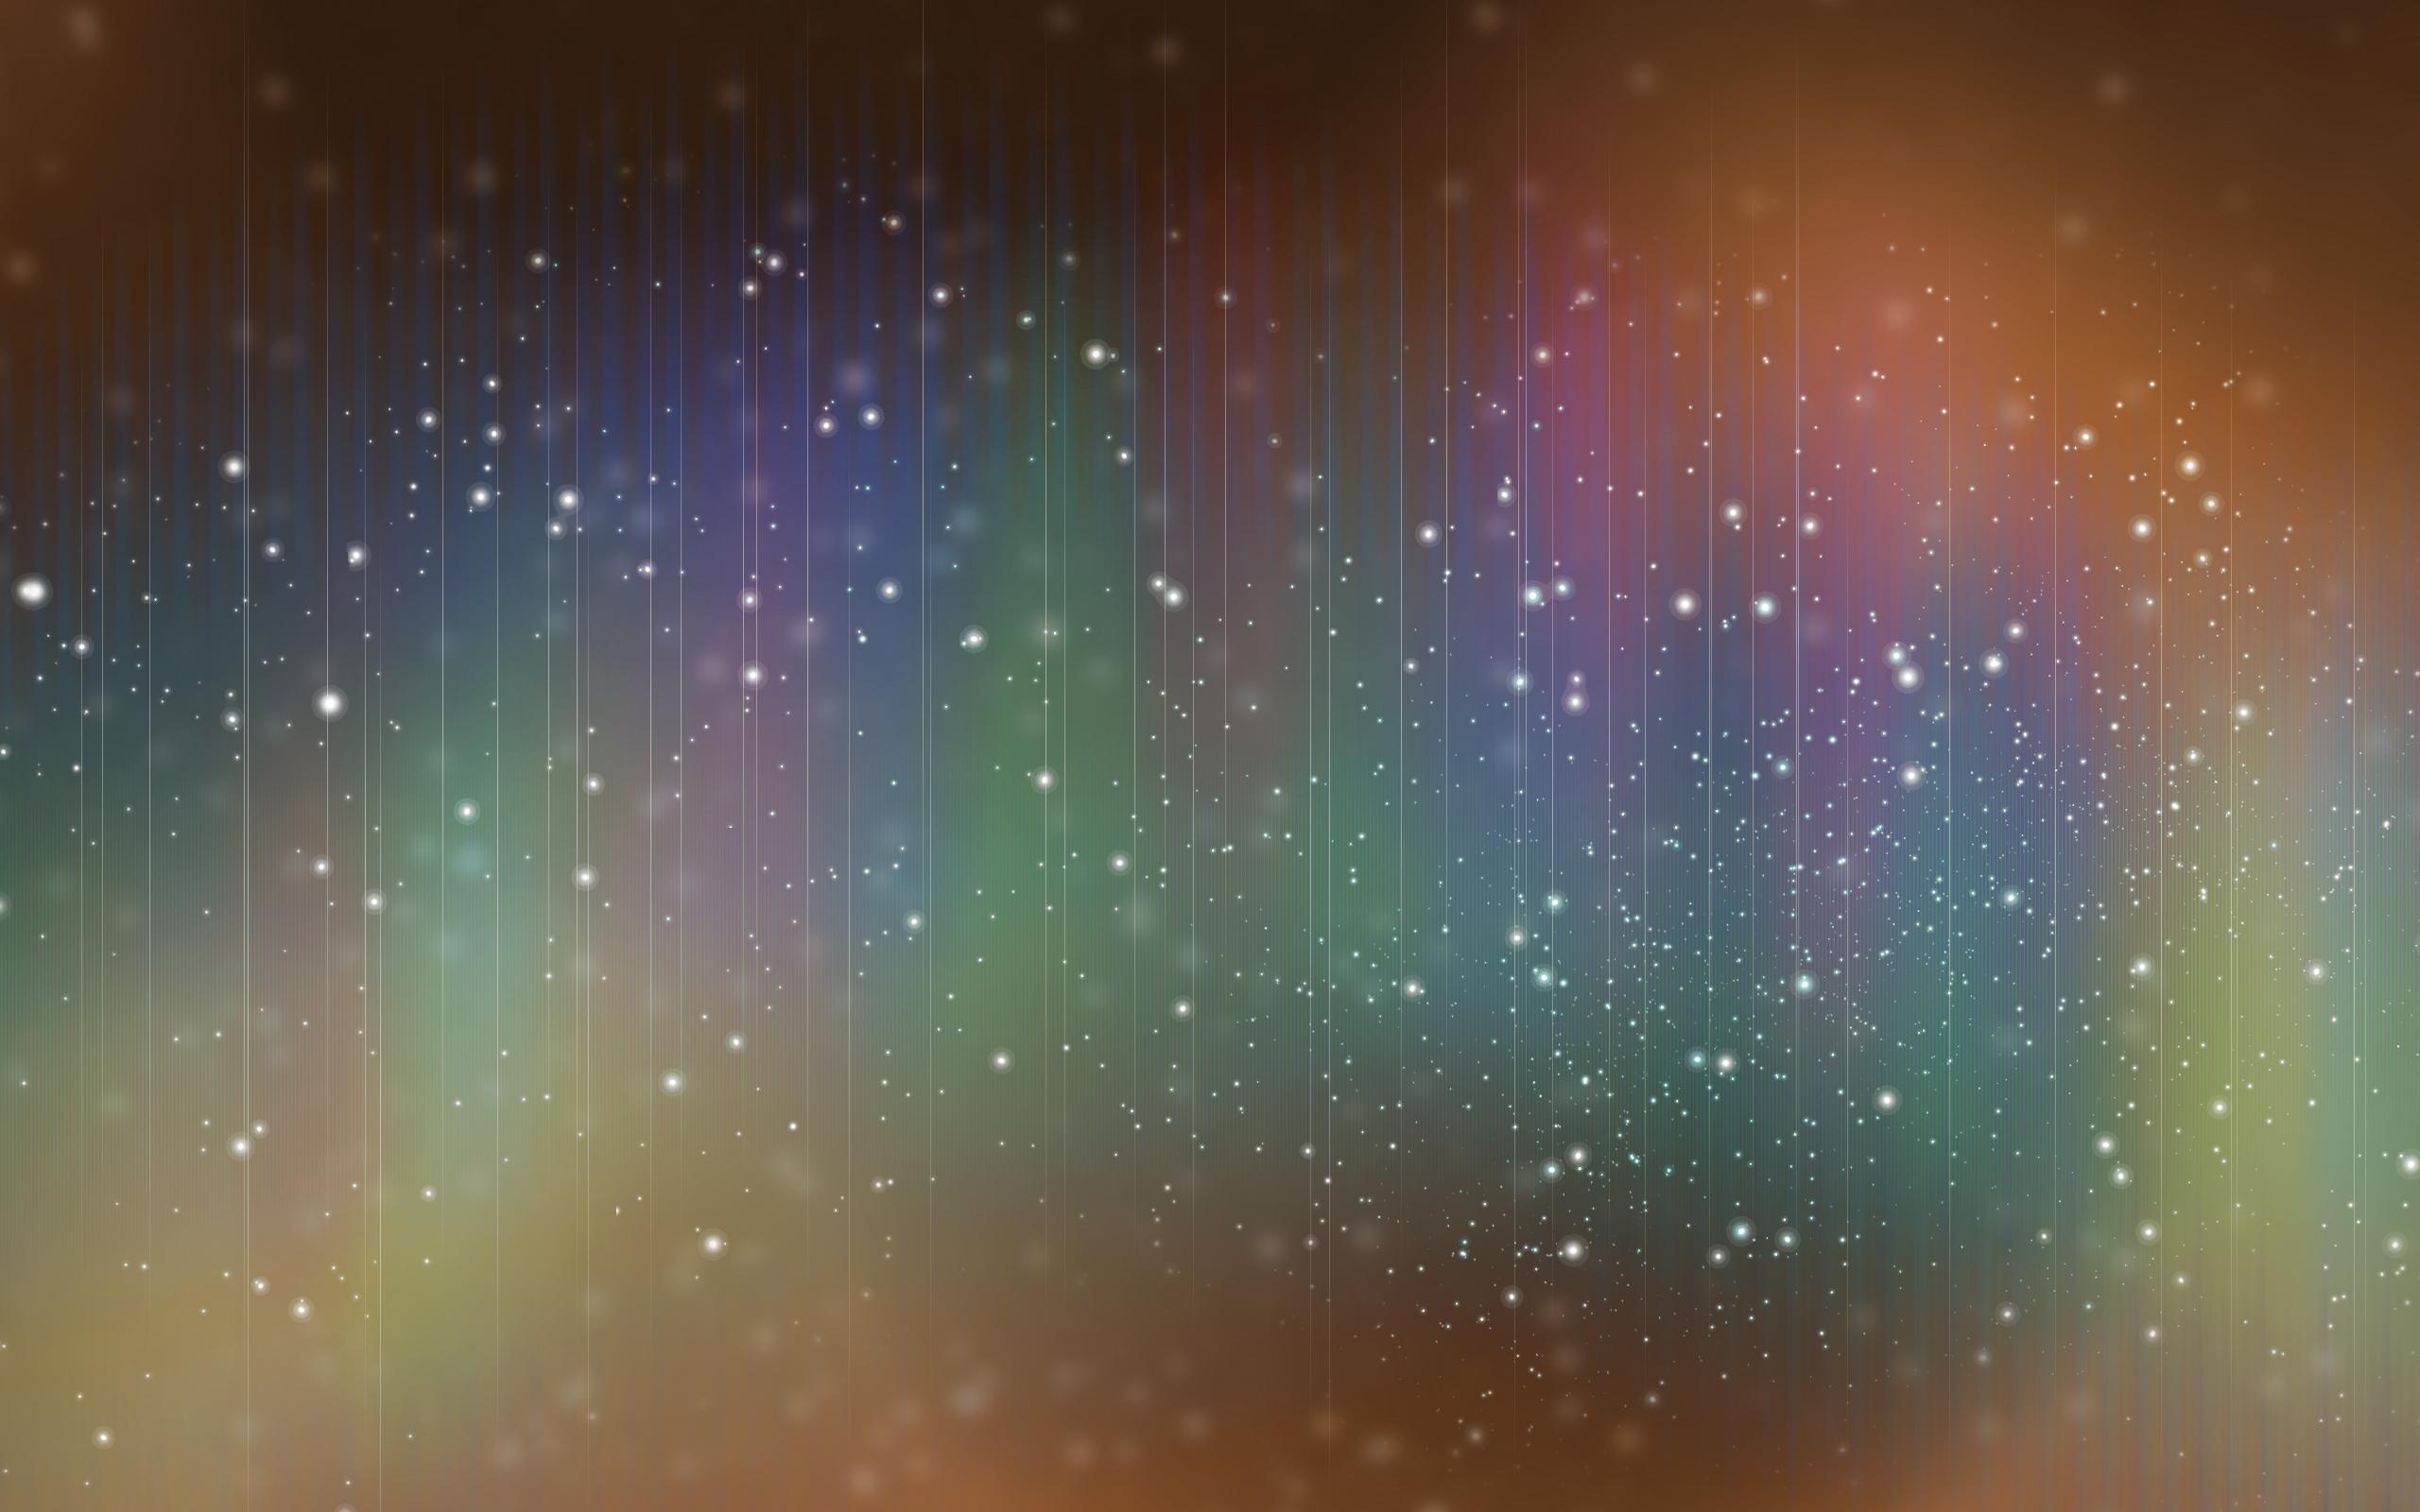 stardust wallpaper 45265